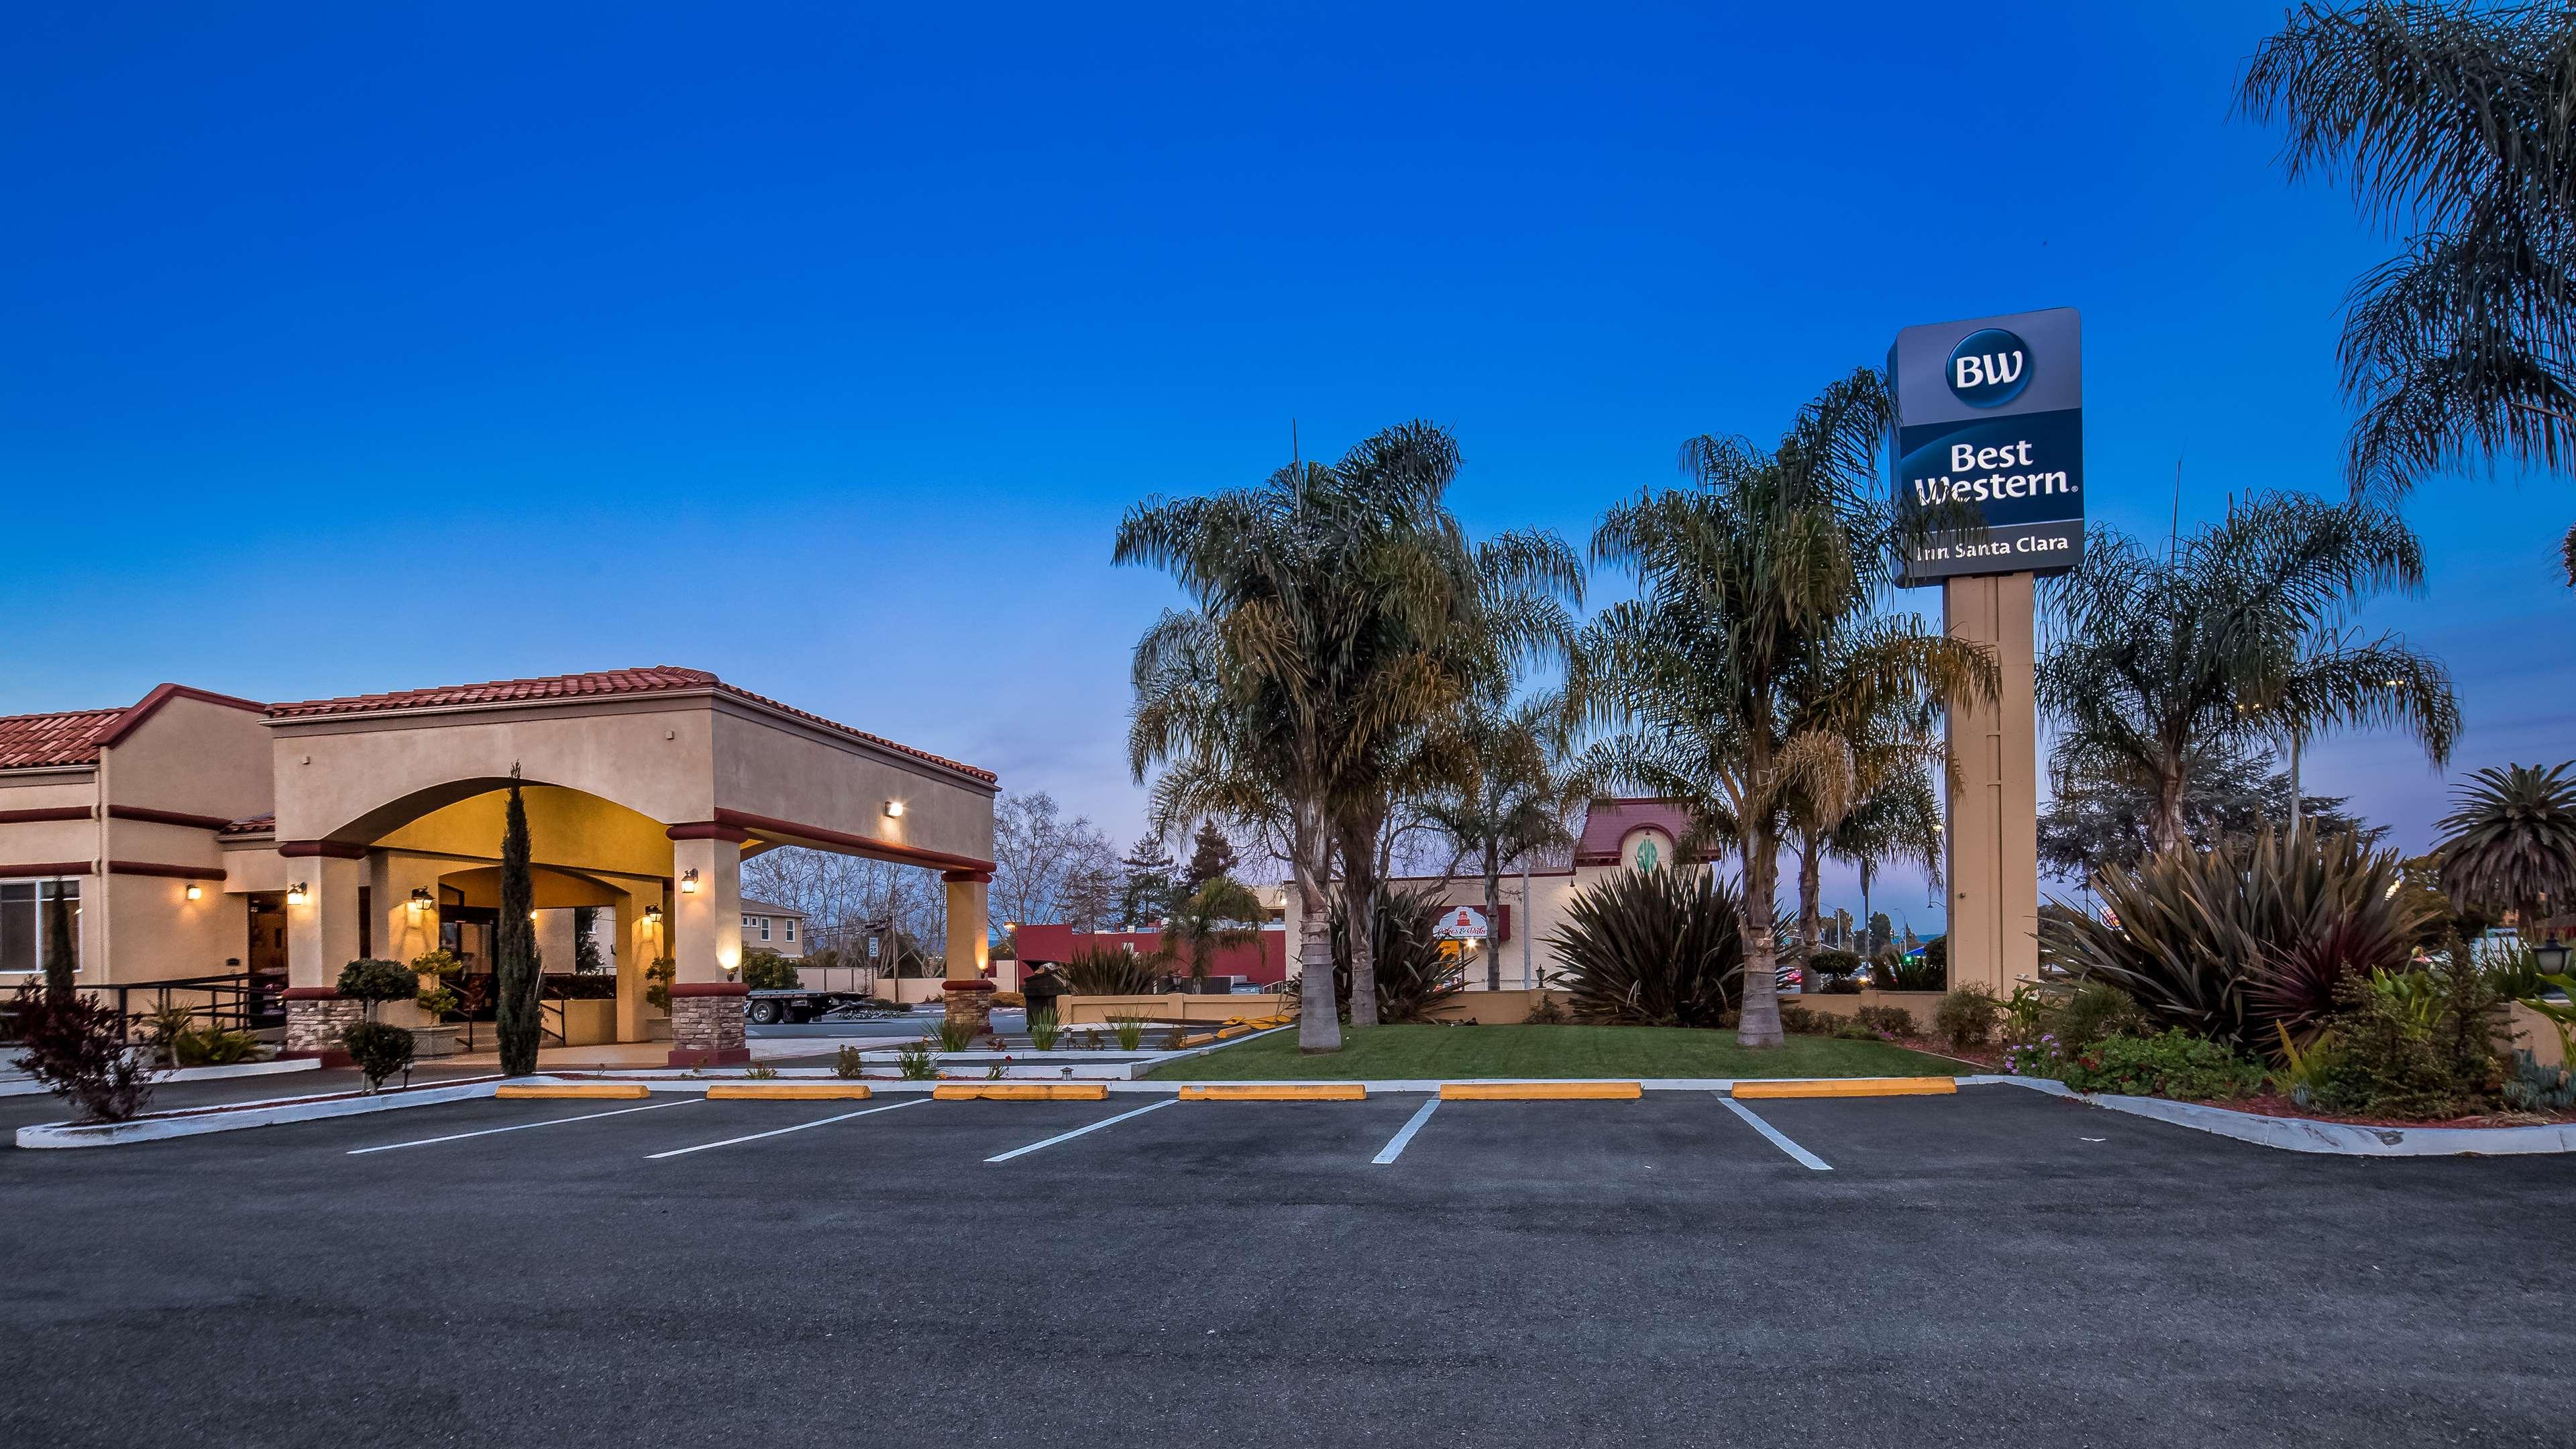 Best Western Inn Santa Clara image 0